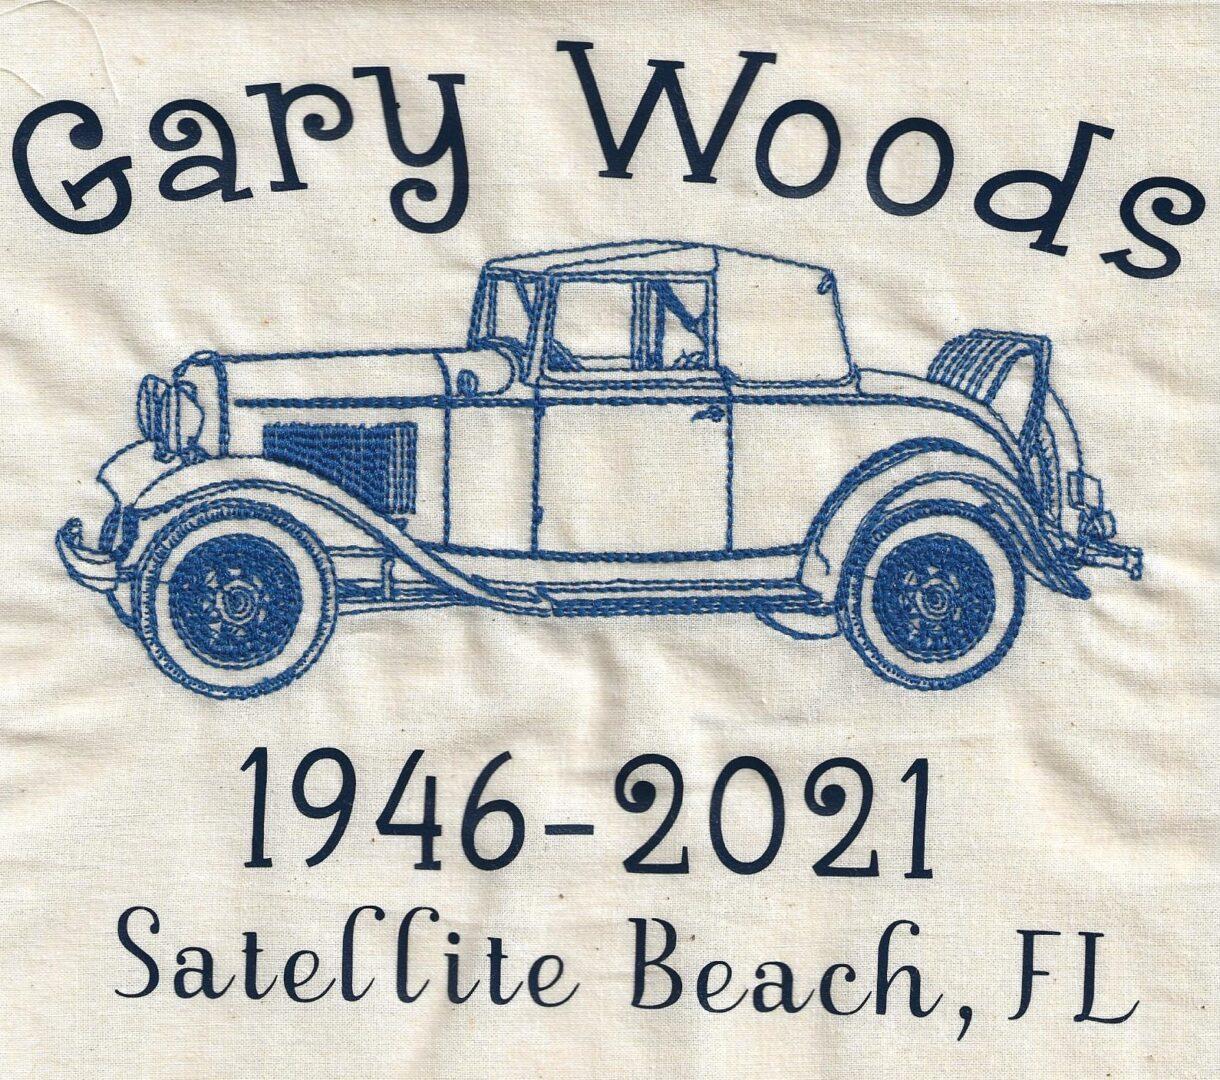 IN MEMORY OF GARY WOODS - 1946 - 2021